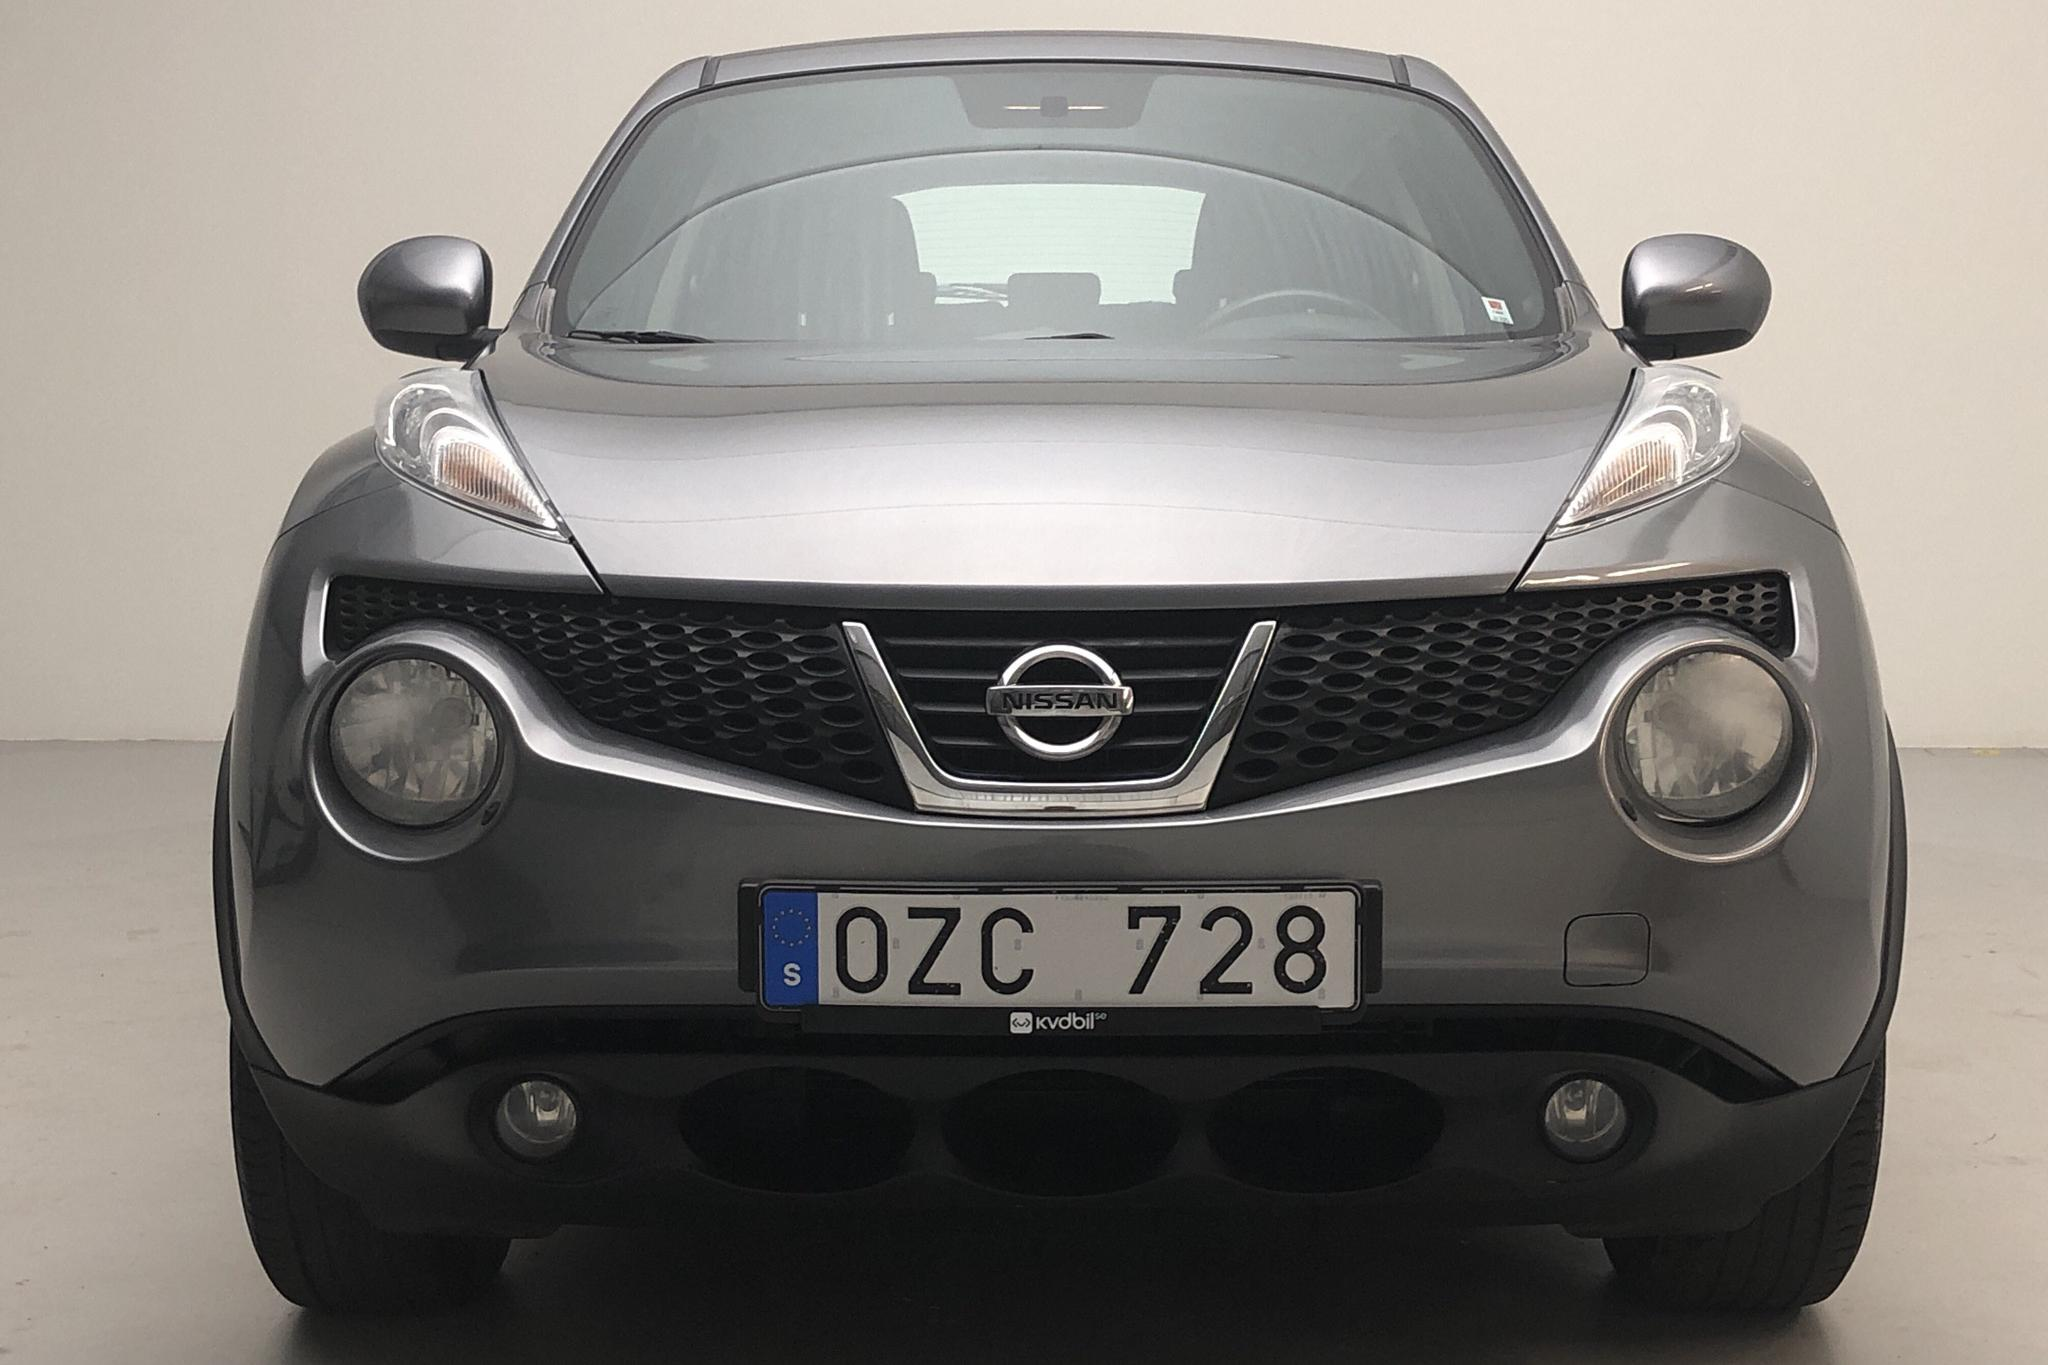 Nissan Juke 1.6 (117hk) - 52 660 km - Manual - gray - 2012